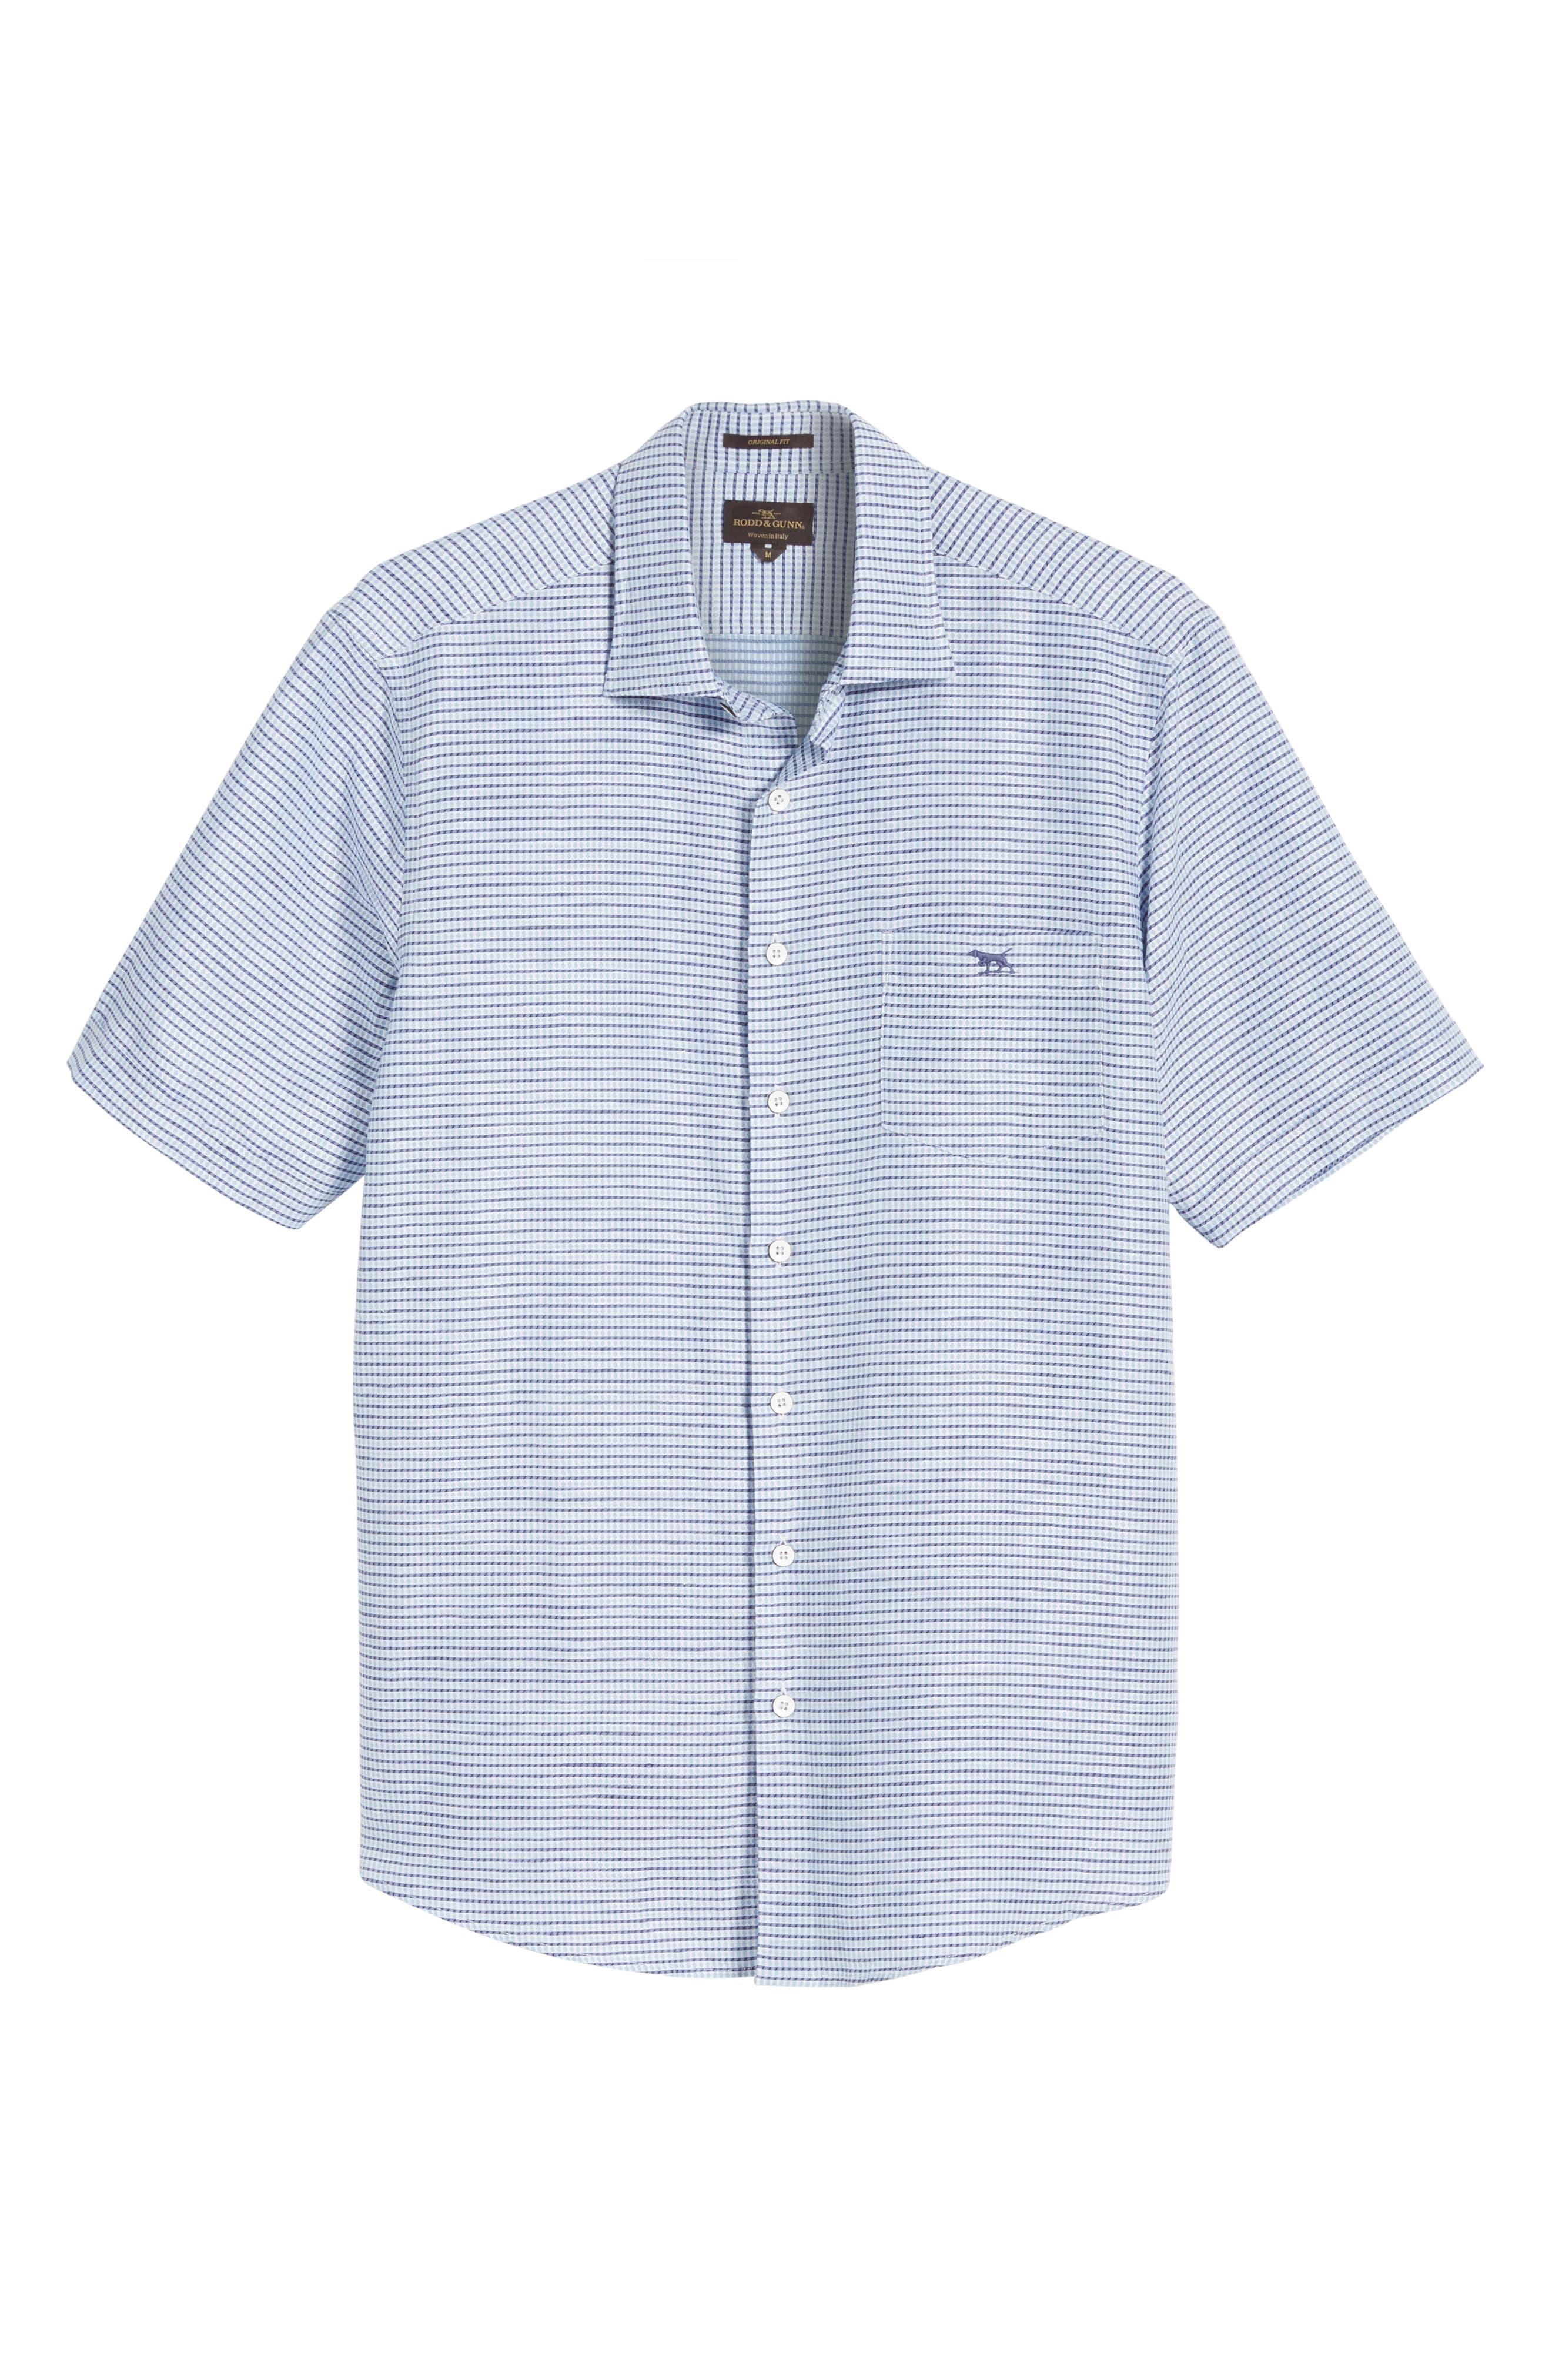 Upper Hutt Original Fit Sport Shirt,                             Alternate thumbnail 6, color,                             459